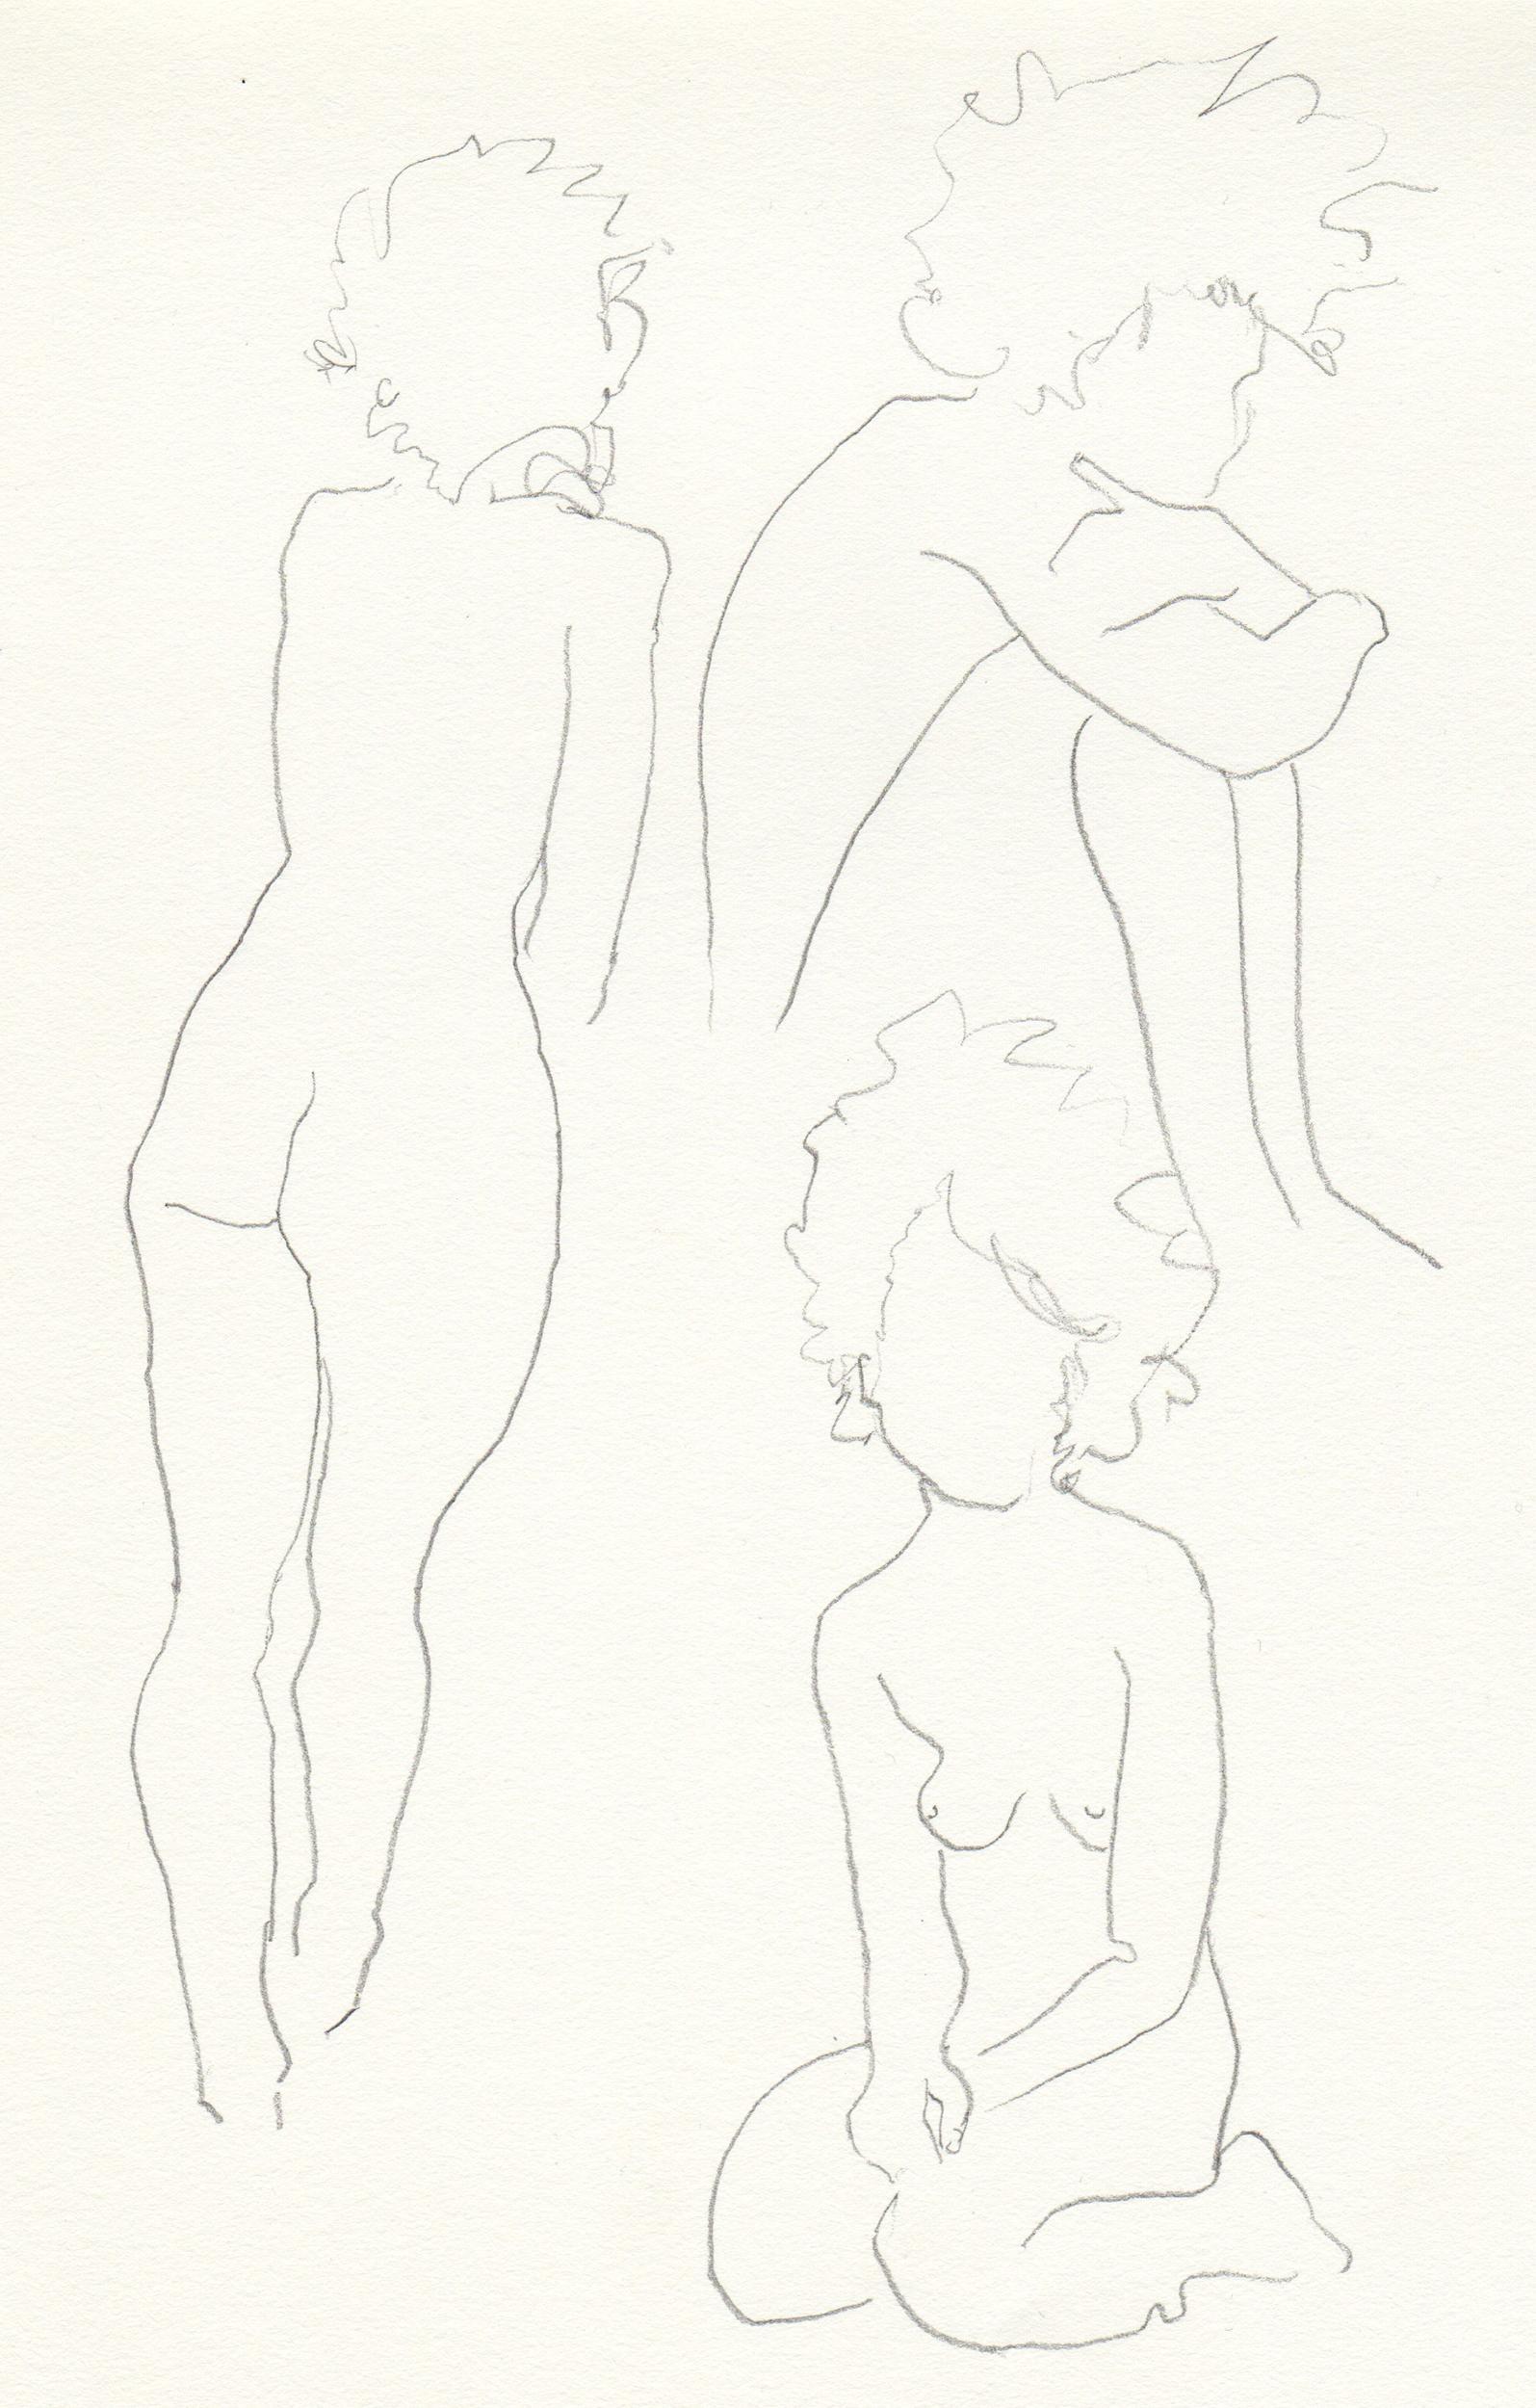 2012_Sketch_F-Beudin_050